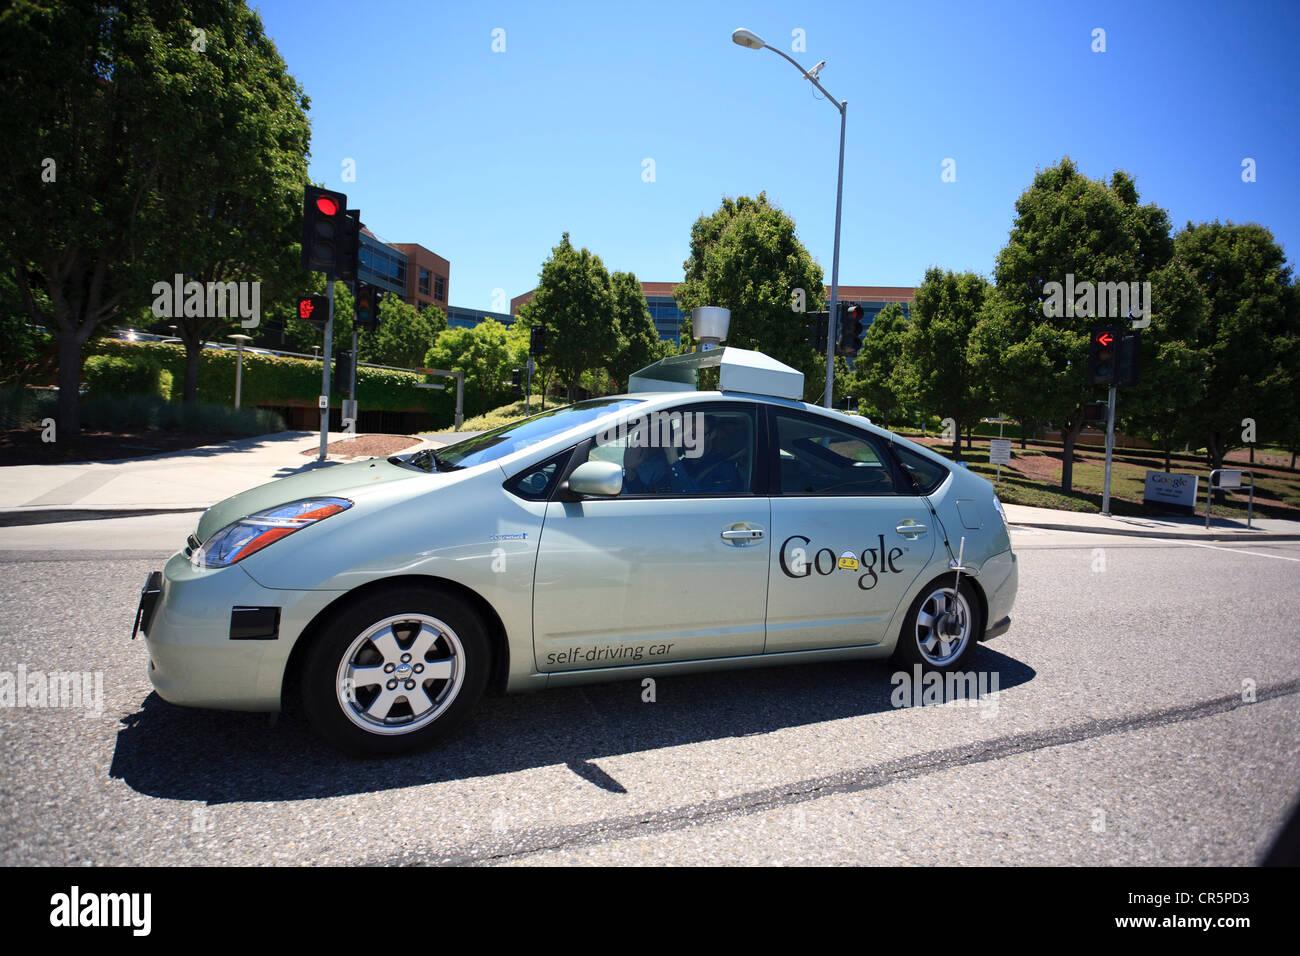 Google self driving car modified toyota prius silicon valley california